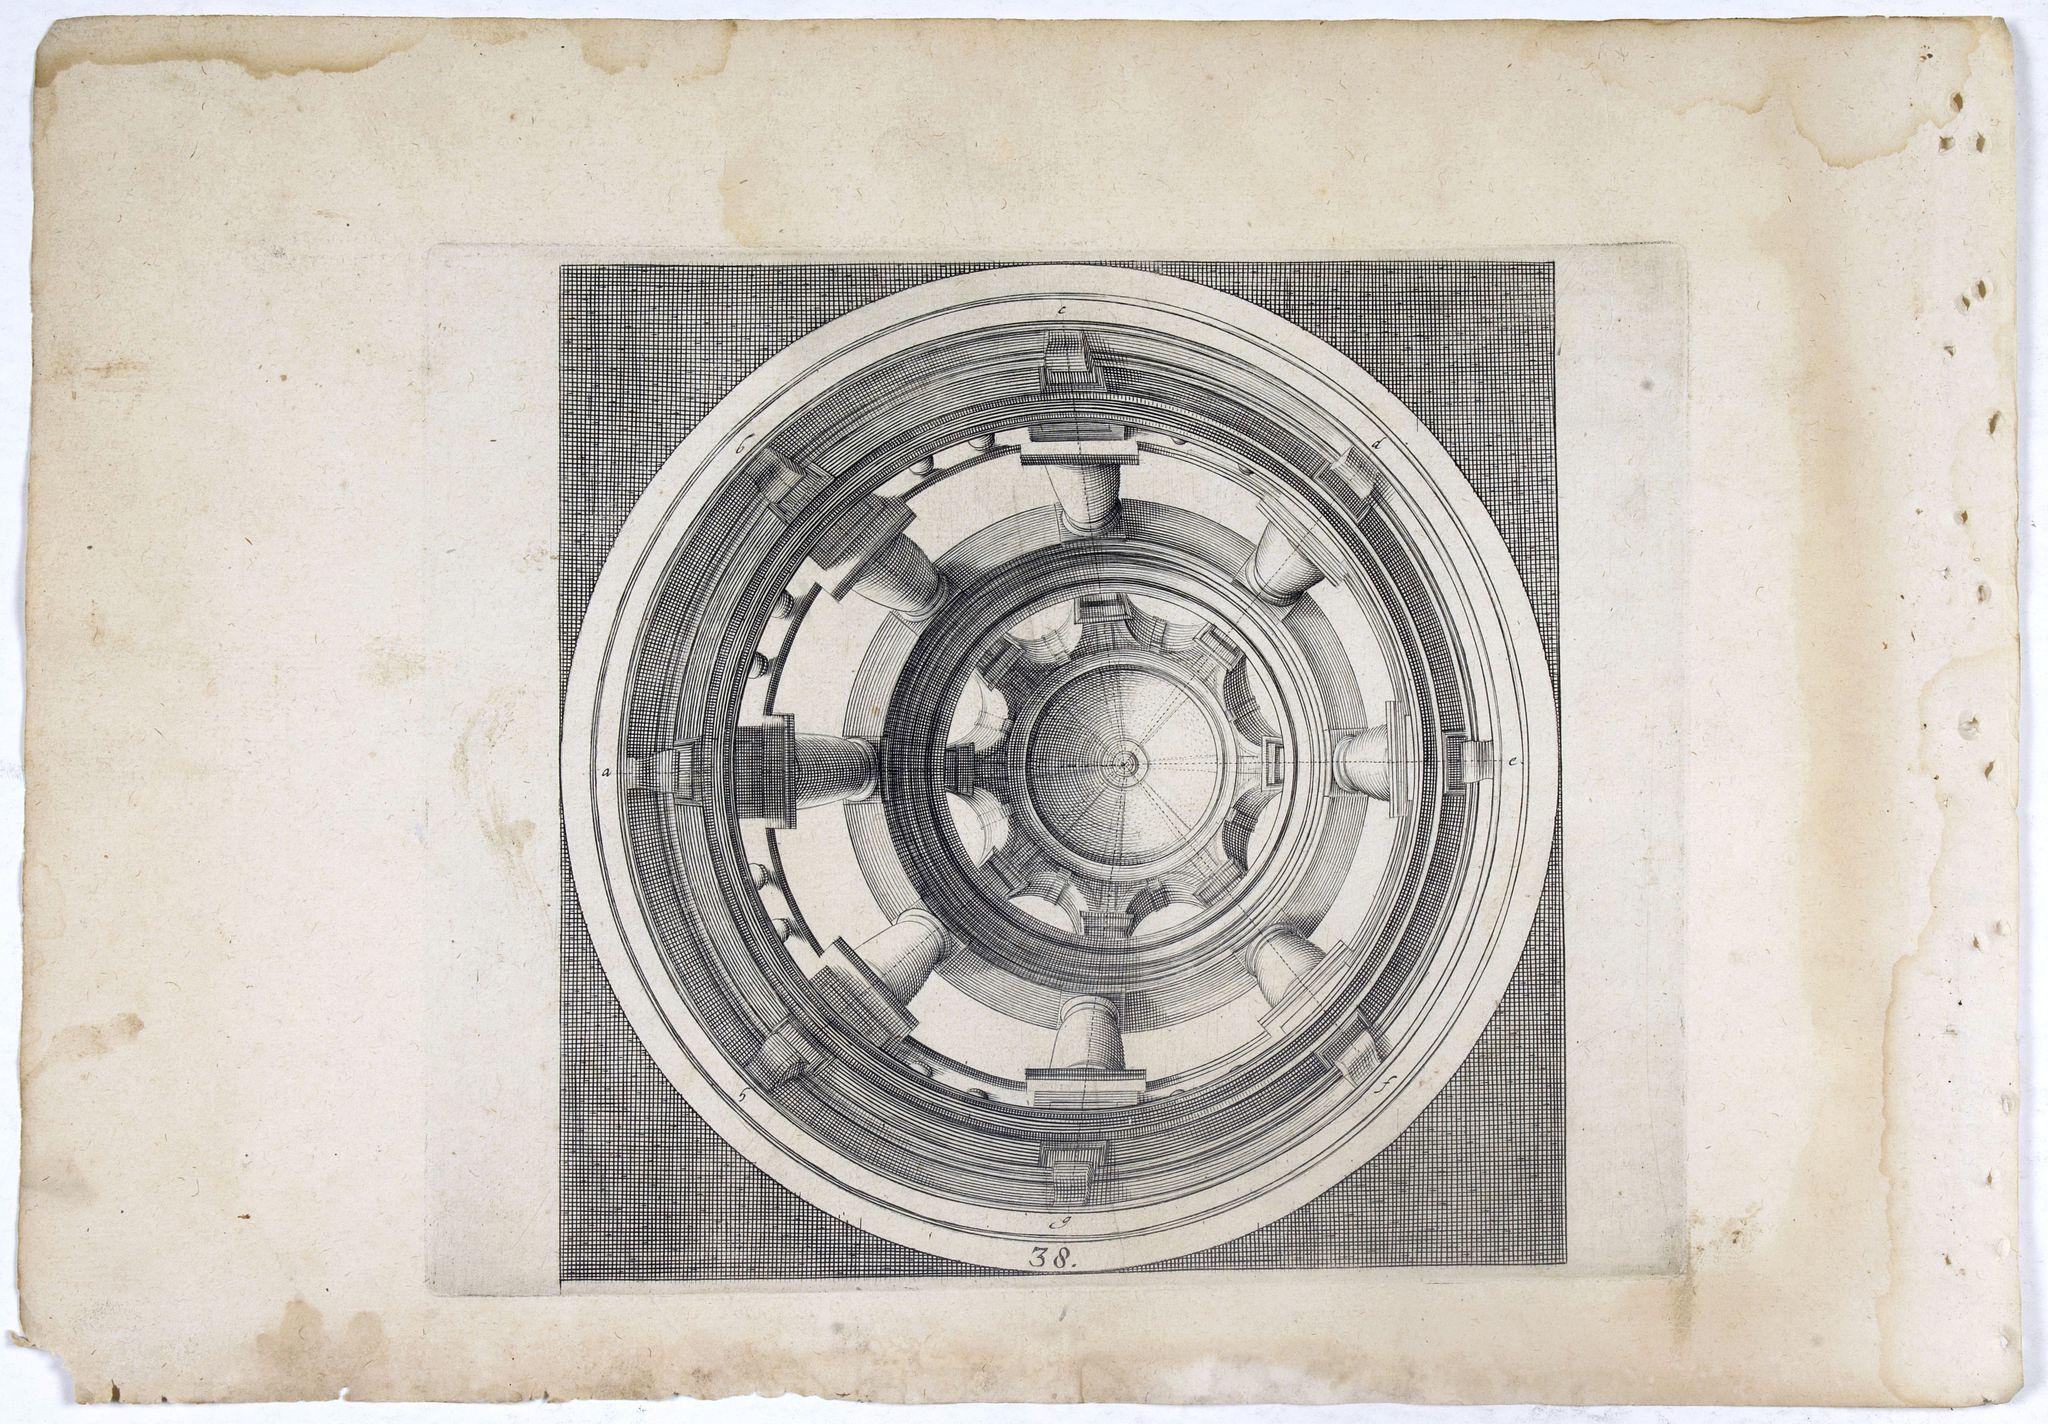 VREDEMAN DE VRIES, J. / HONDIUS, H. -  Perspective print by Vredeman de Vries. 38.